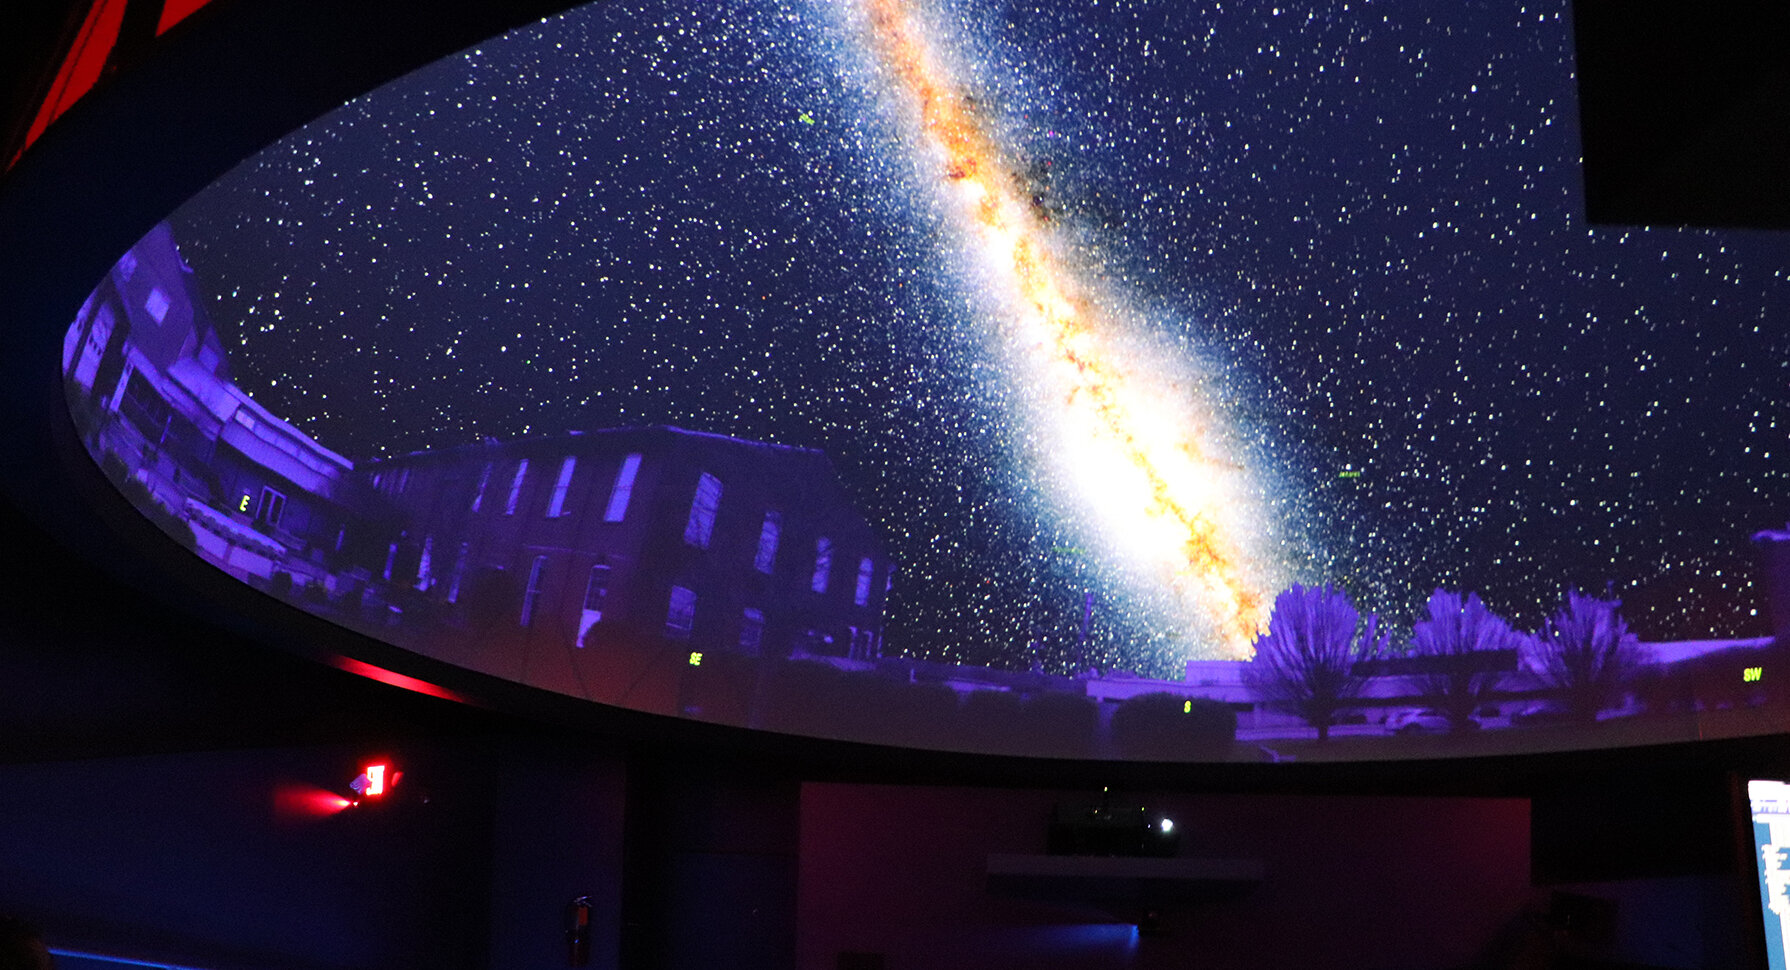 UoL-ILN-TheWorks-AstronoME-1.jpg